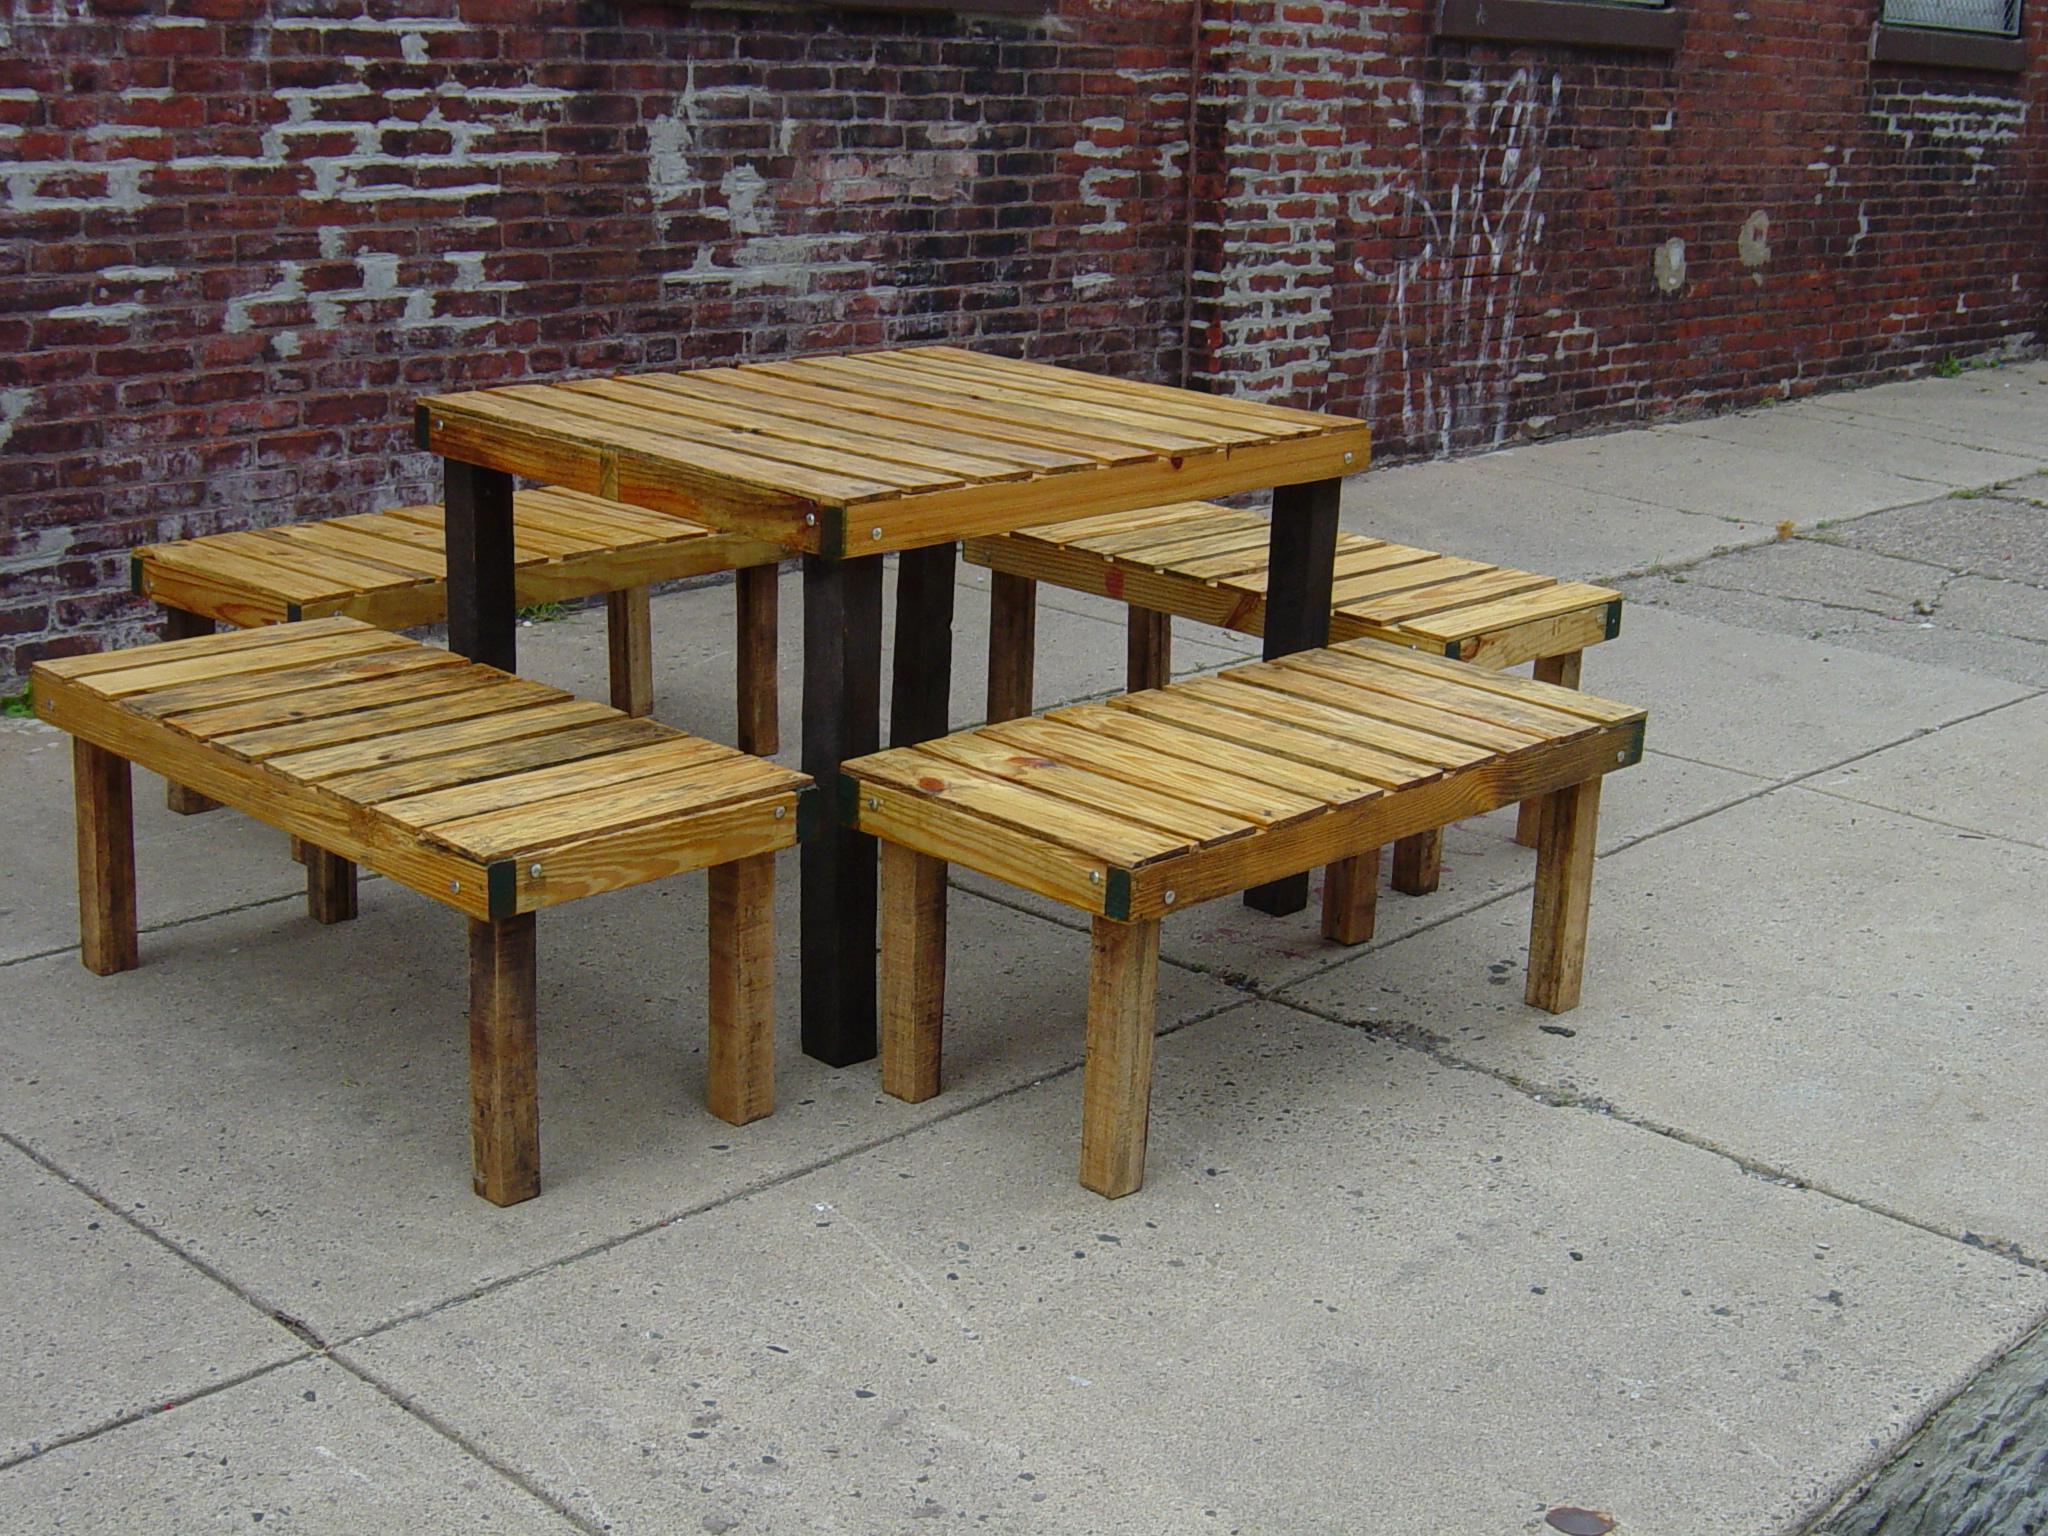 Picnic style kitchen table Photo - 2   Kitchen ideas